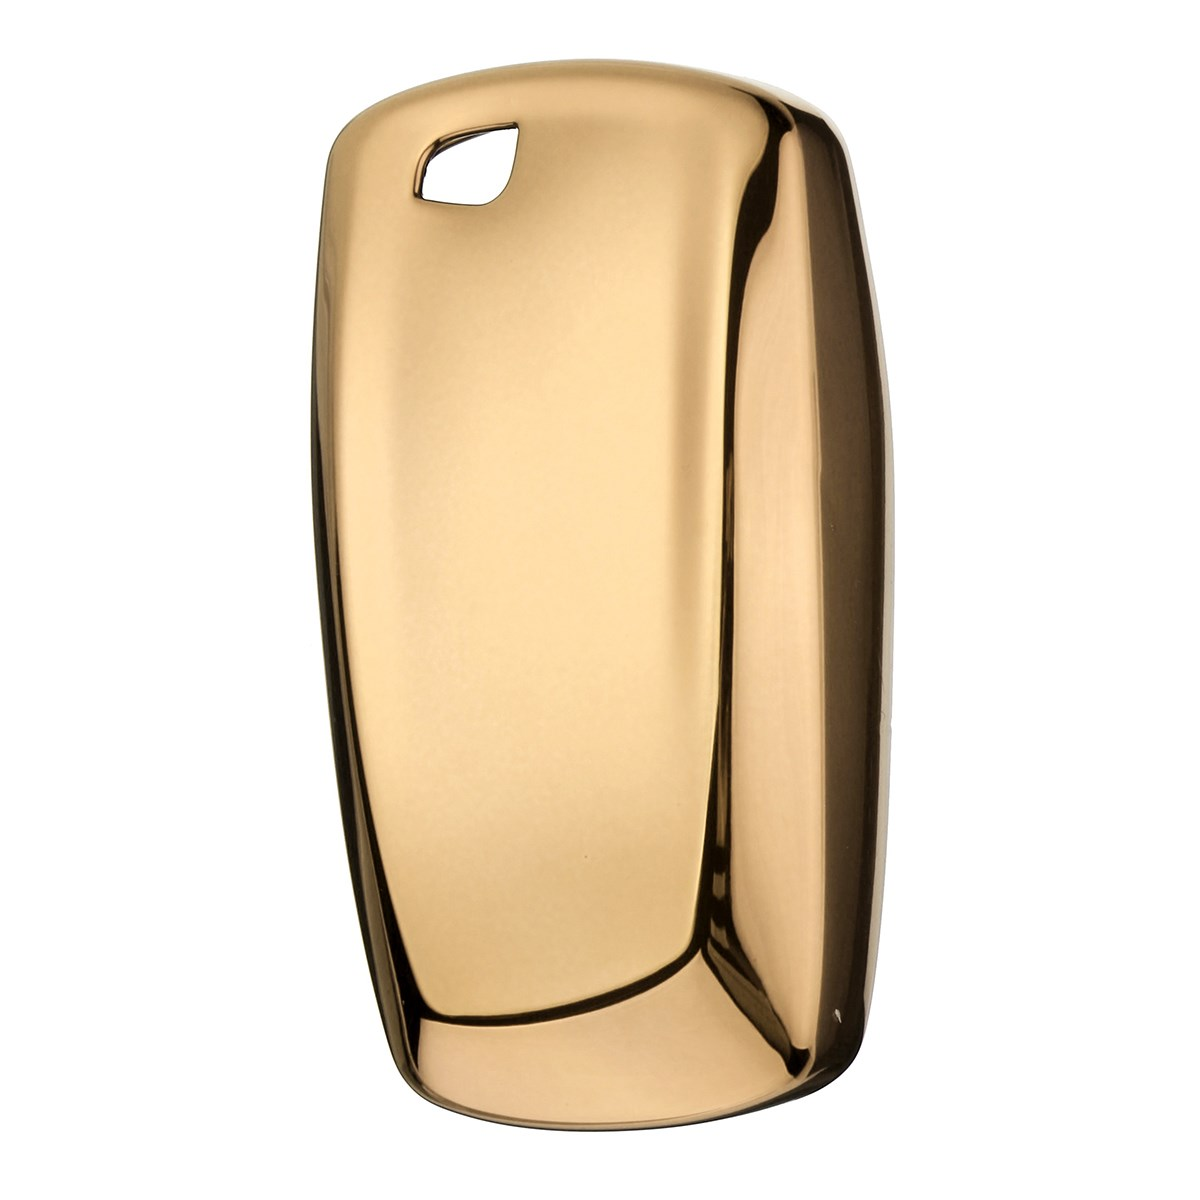 TPU Remote Smart Key Cover Fob Case Shell Black For BMW M5 M6 1 3 4 5 6 Series